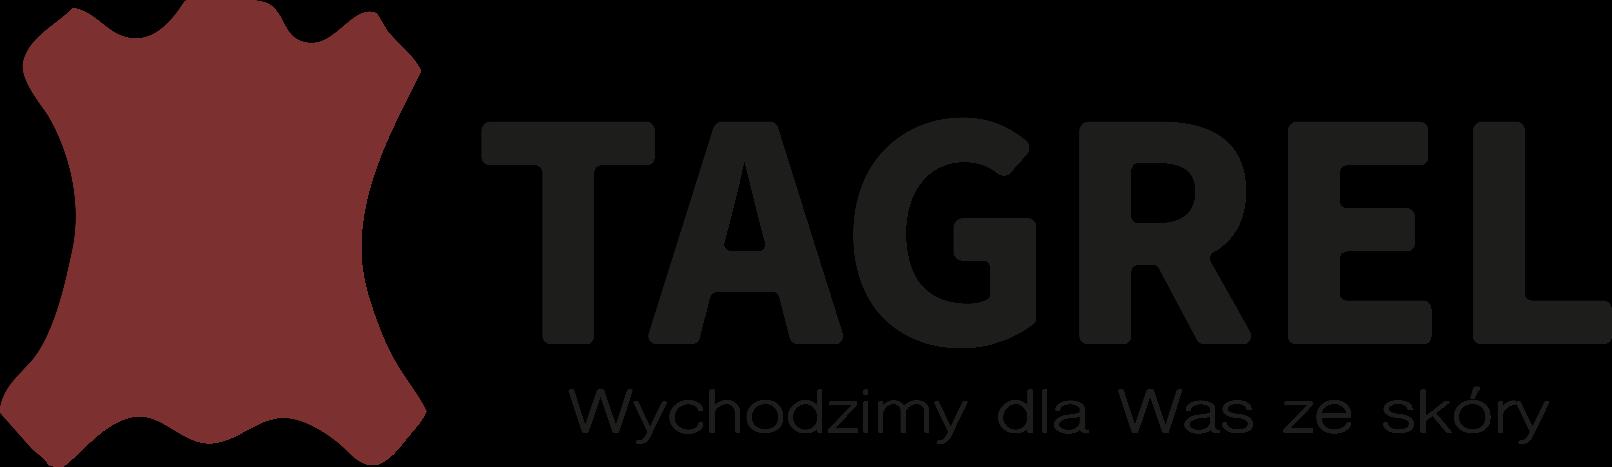 Tagrel